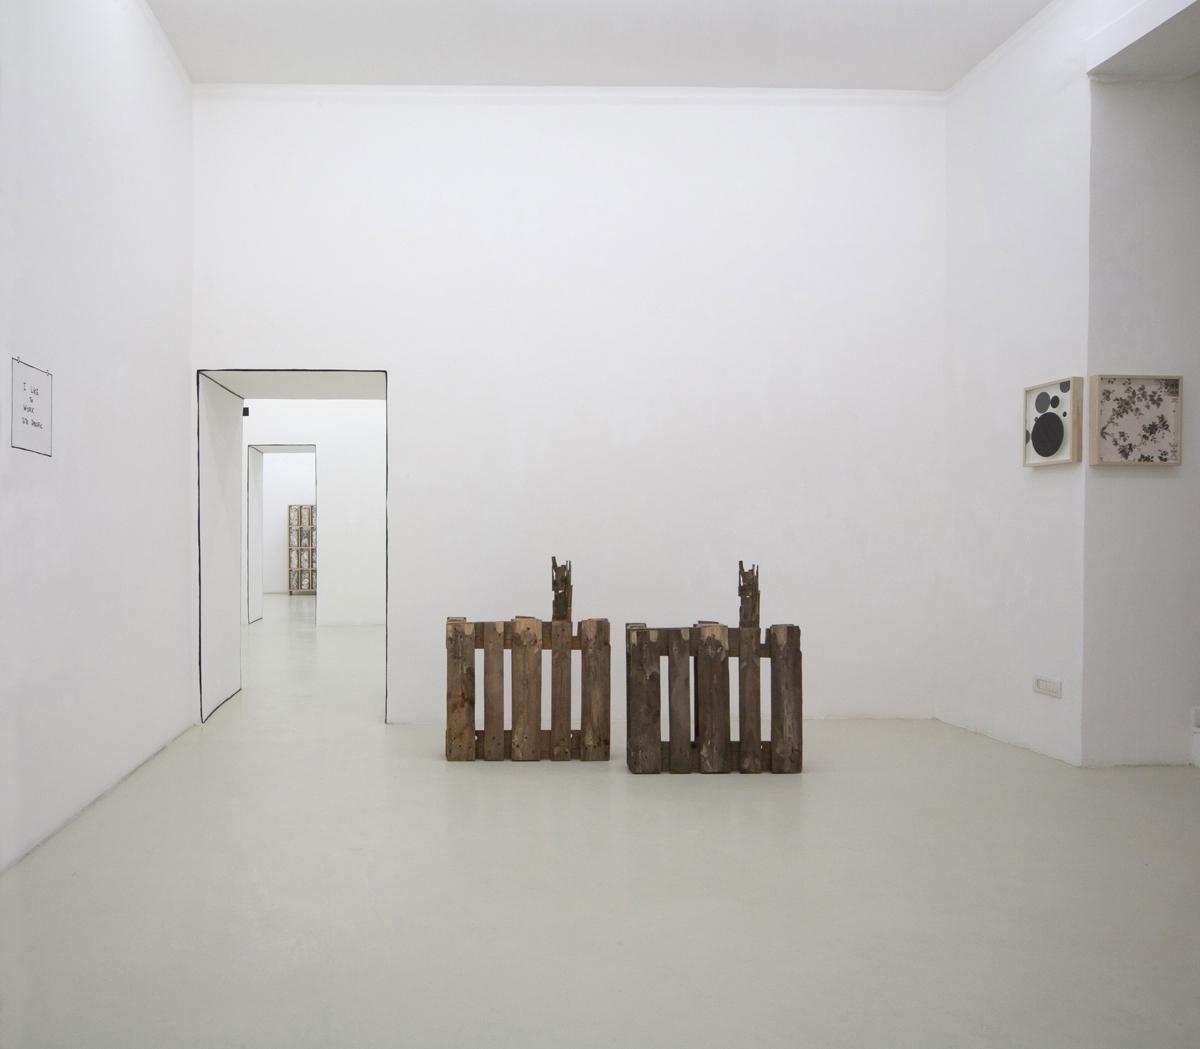 Marco Raparelli, vedovamazzei, exhibition view